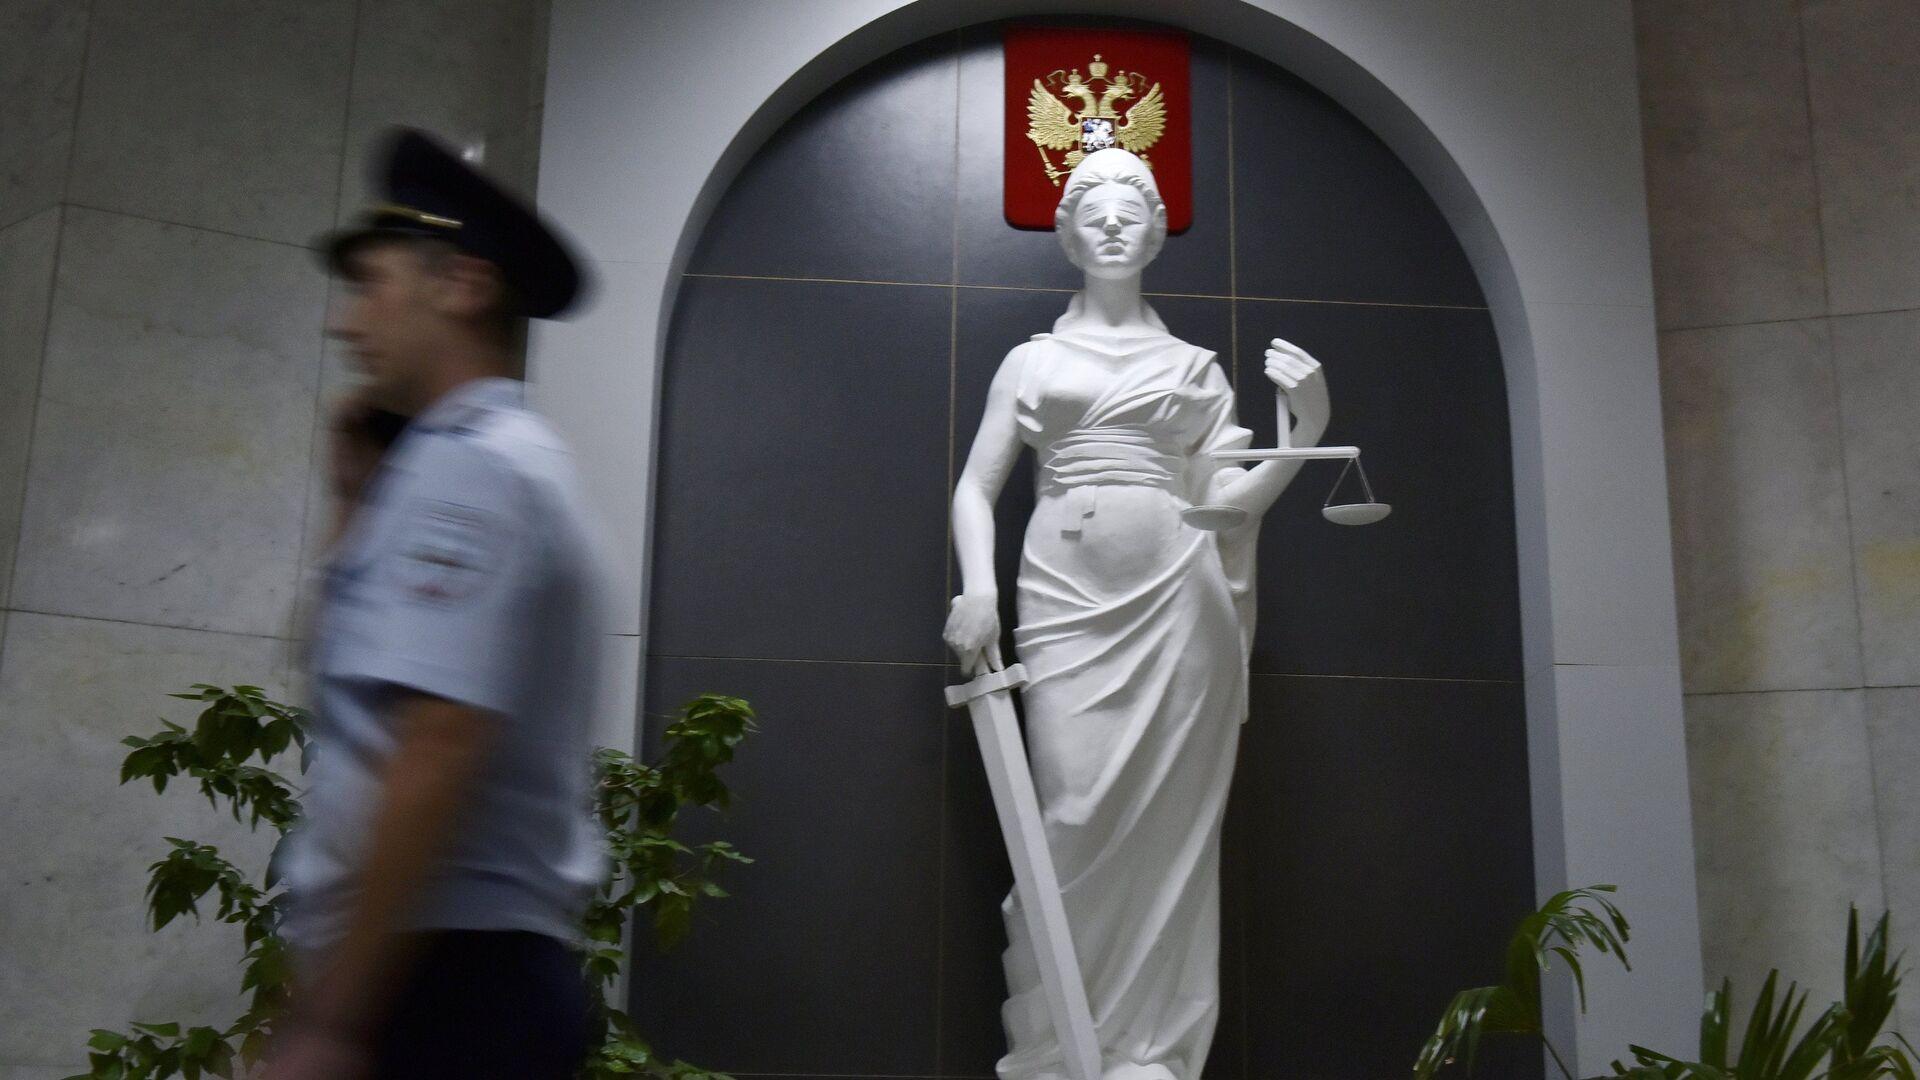 Статуя богини правосудия (Фемида) в здании суда - РИА Новости, 1920, 09.12.2020